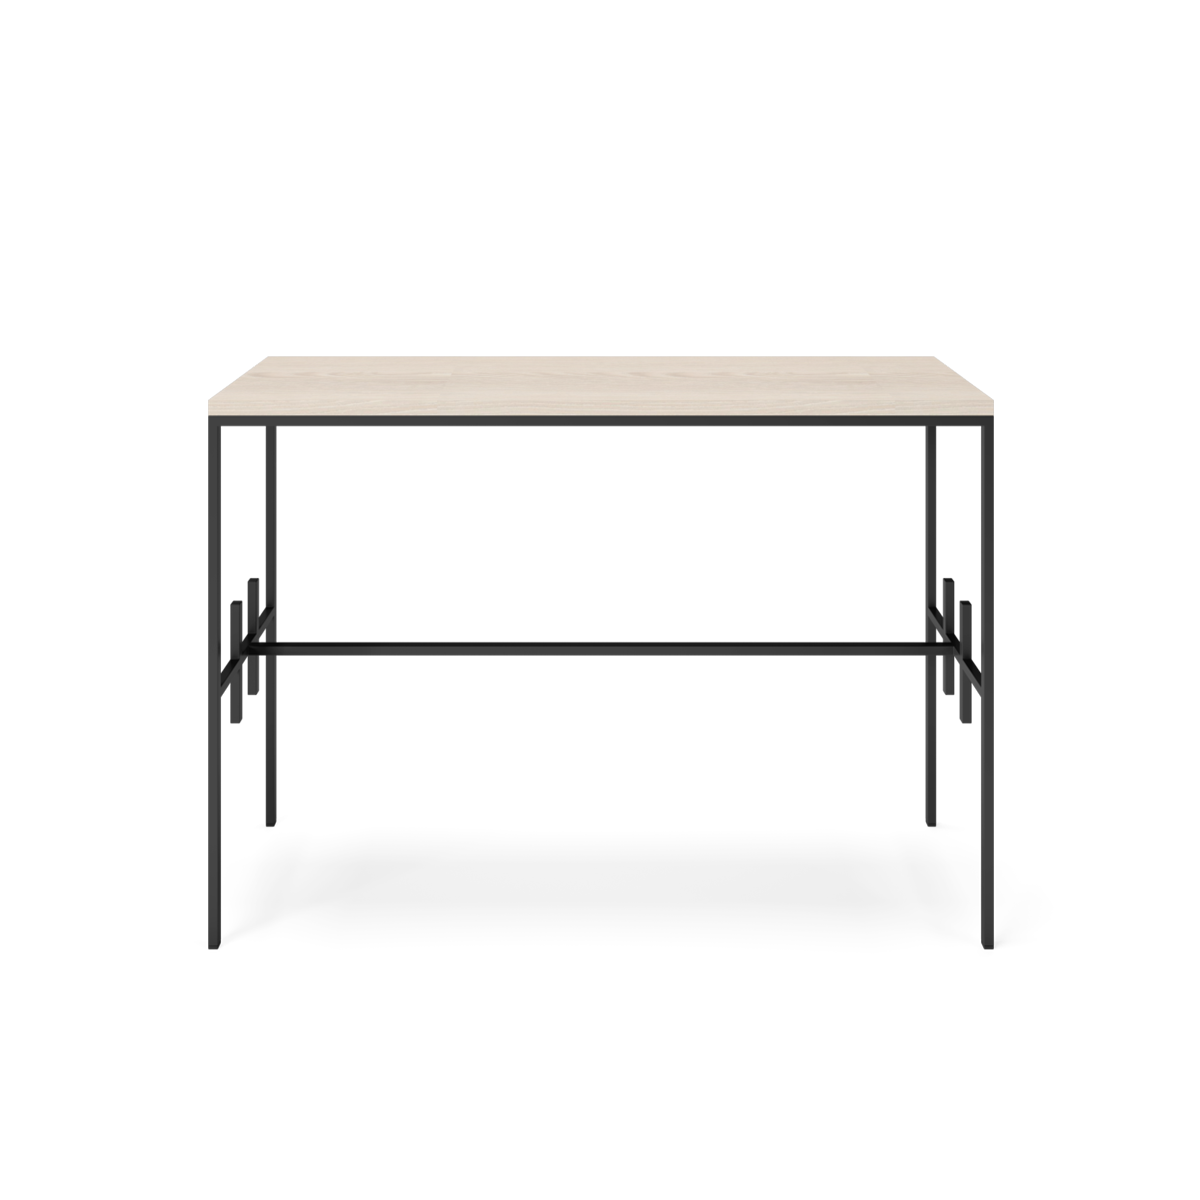 H-Sideboard Efva Attling - The Högdalen collection